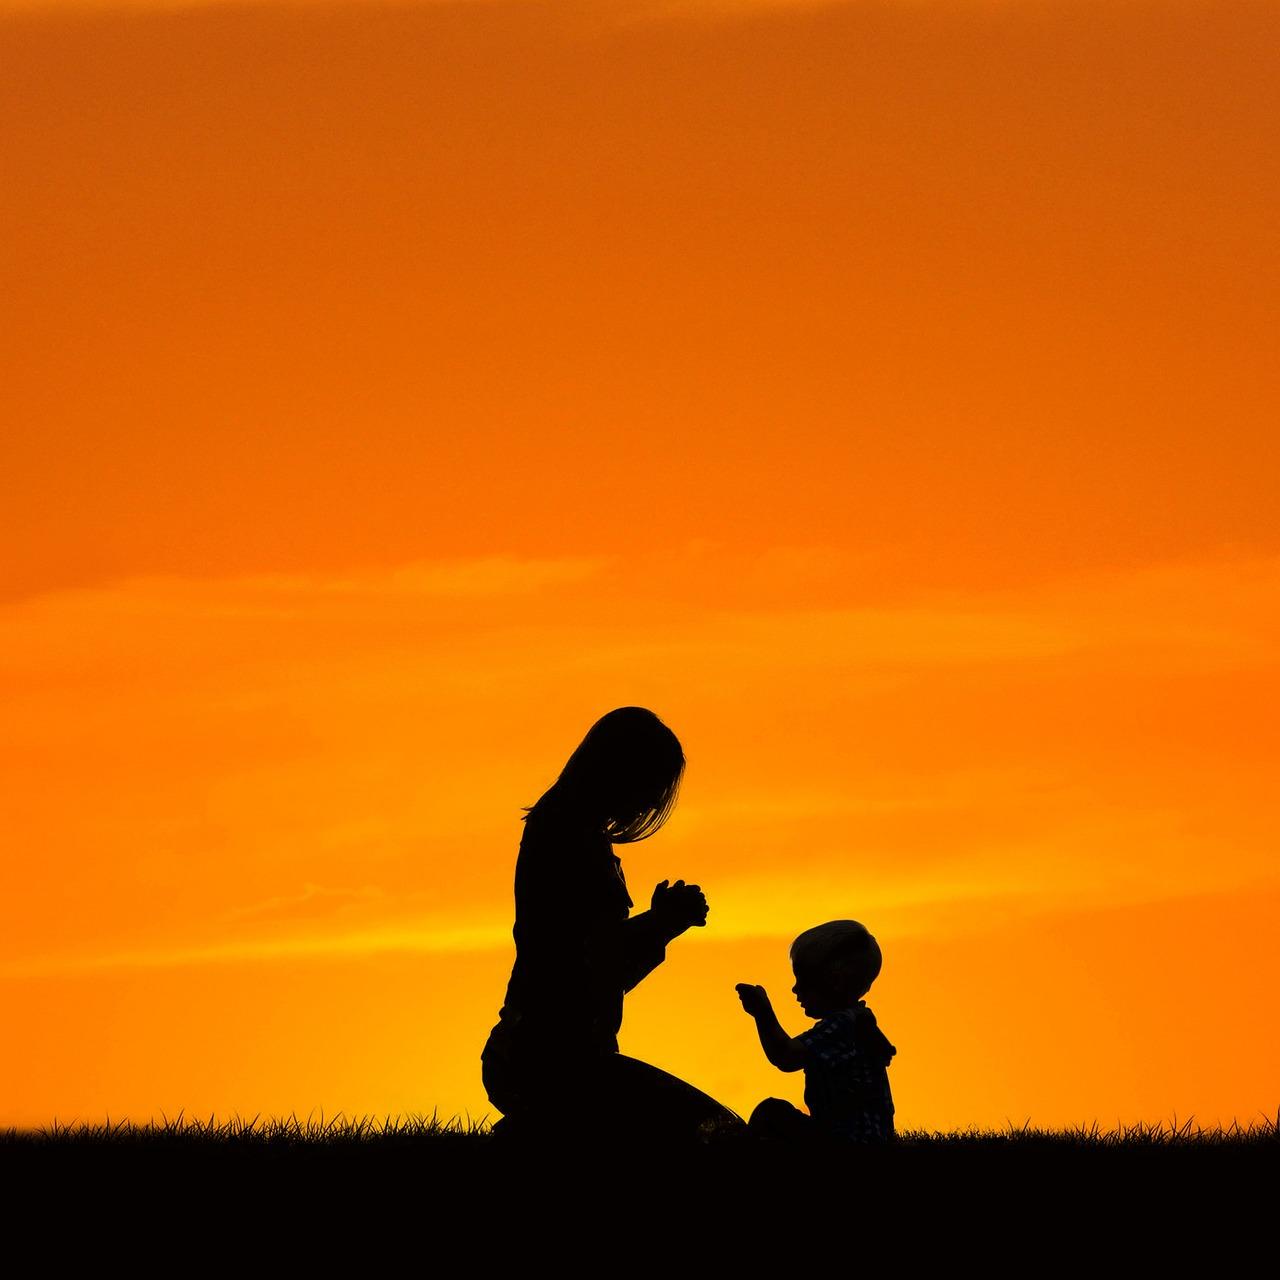 Mom Praying With Son - Free photo on Pixabay